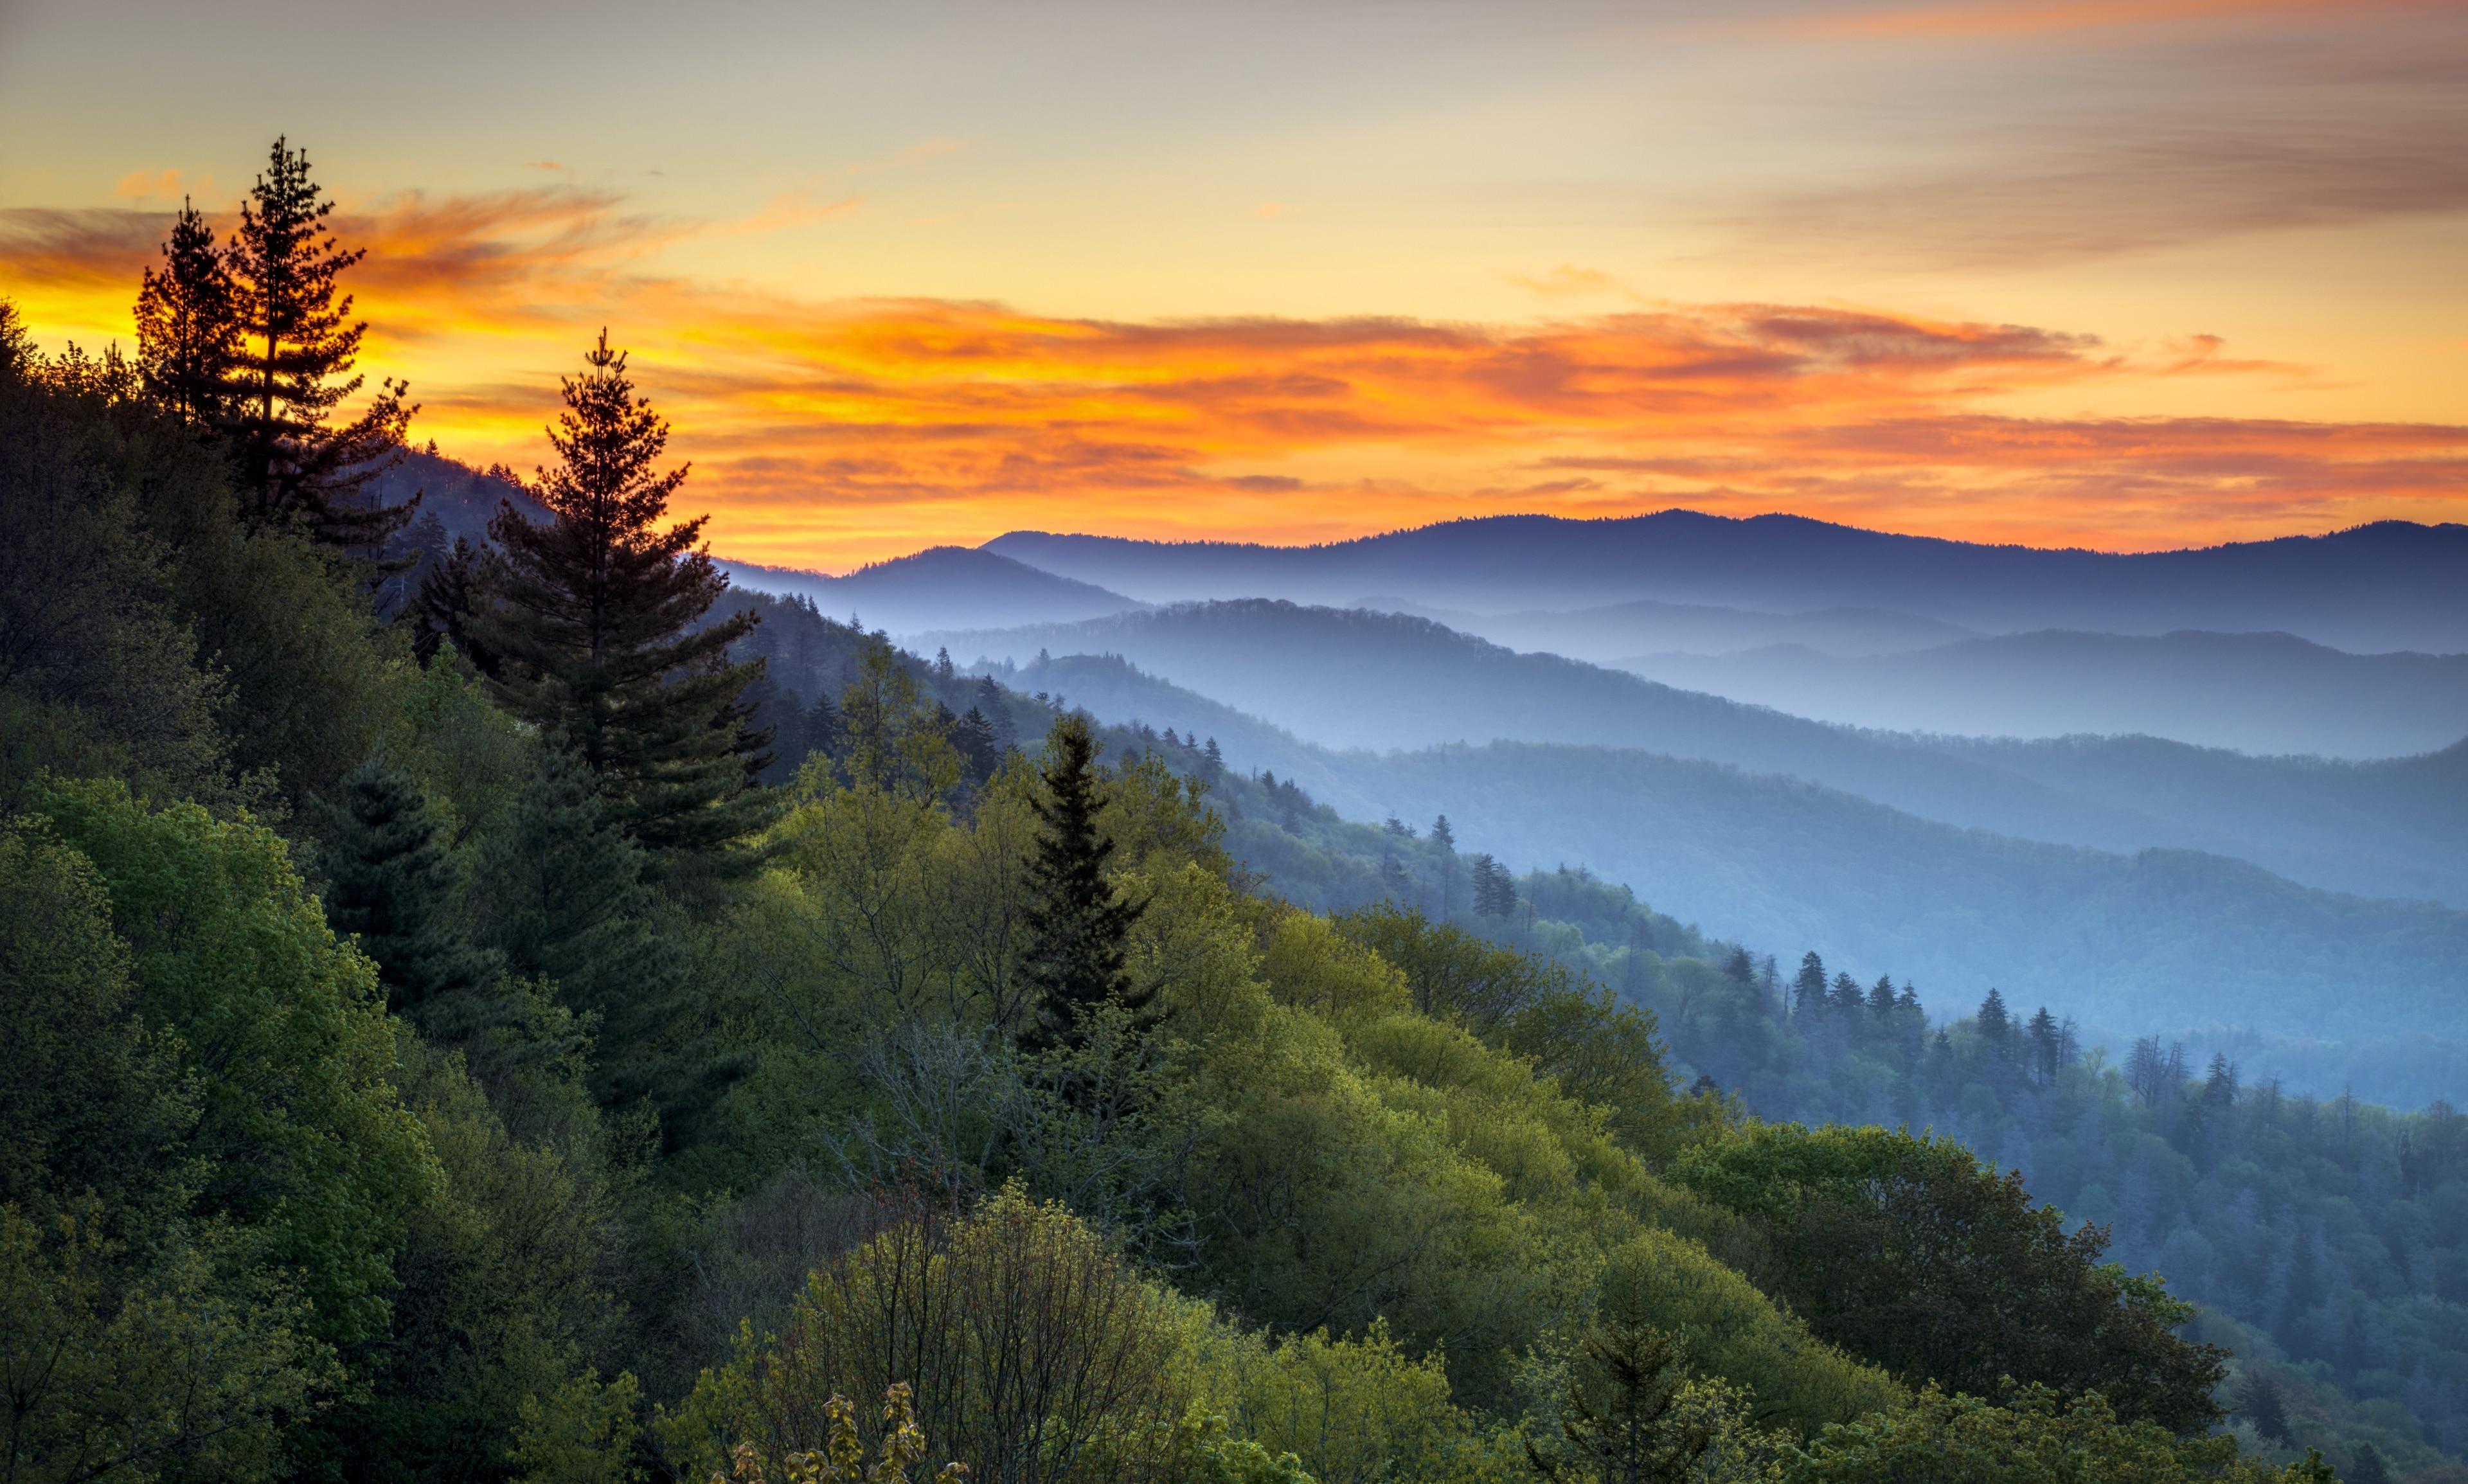 Gatlinburg, Tennessee, United States of America